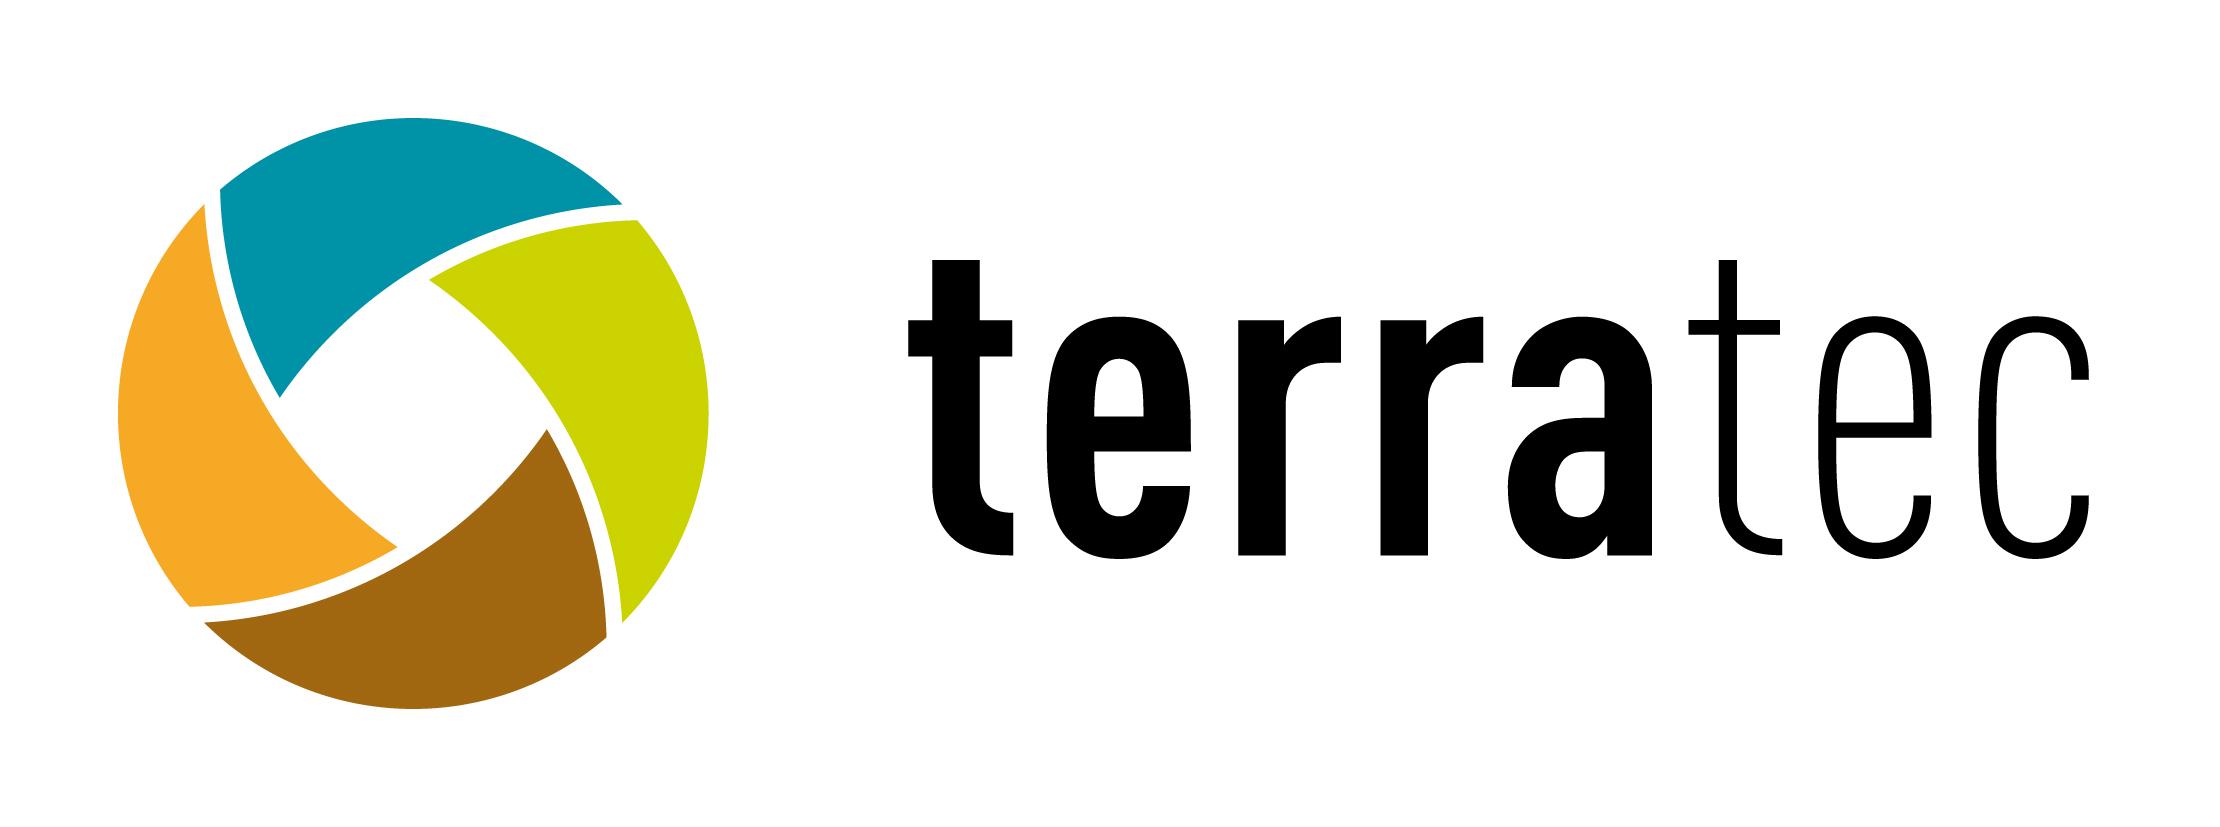 Terratec